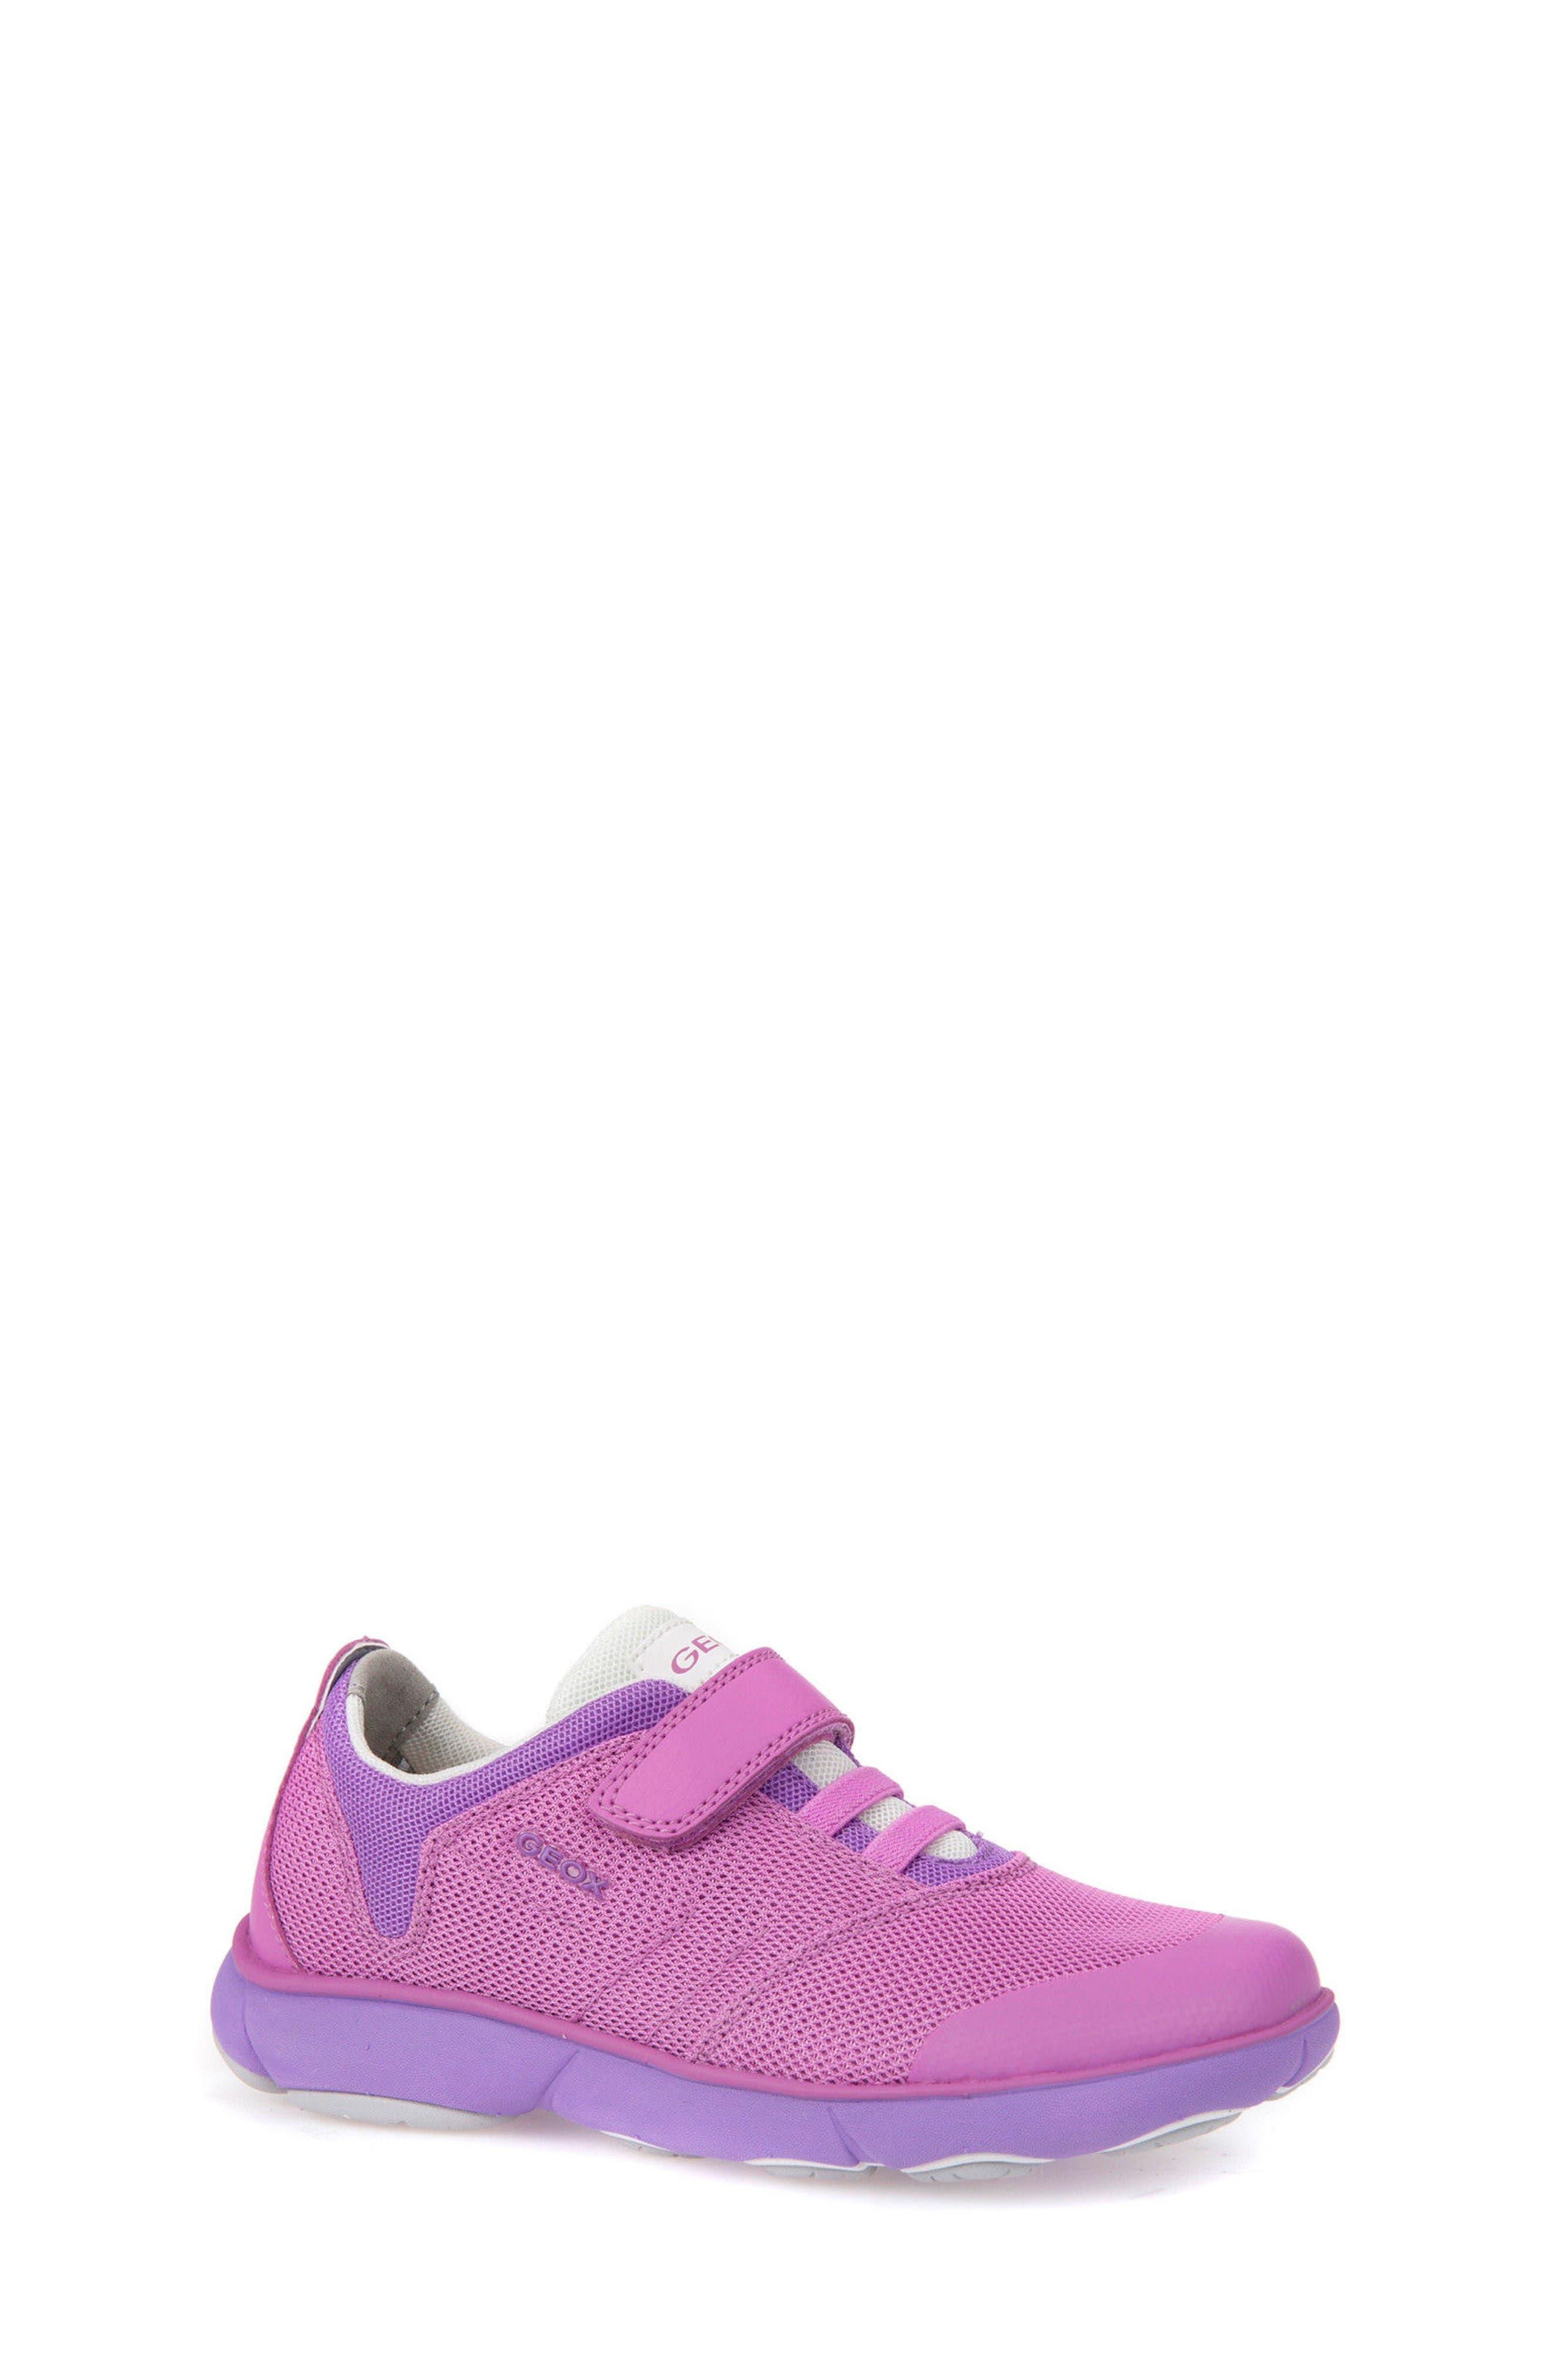 Geox Jr Nebula Sneaker (Toddler, Little Kid & Big Kid)